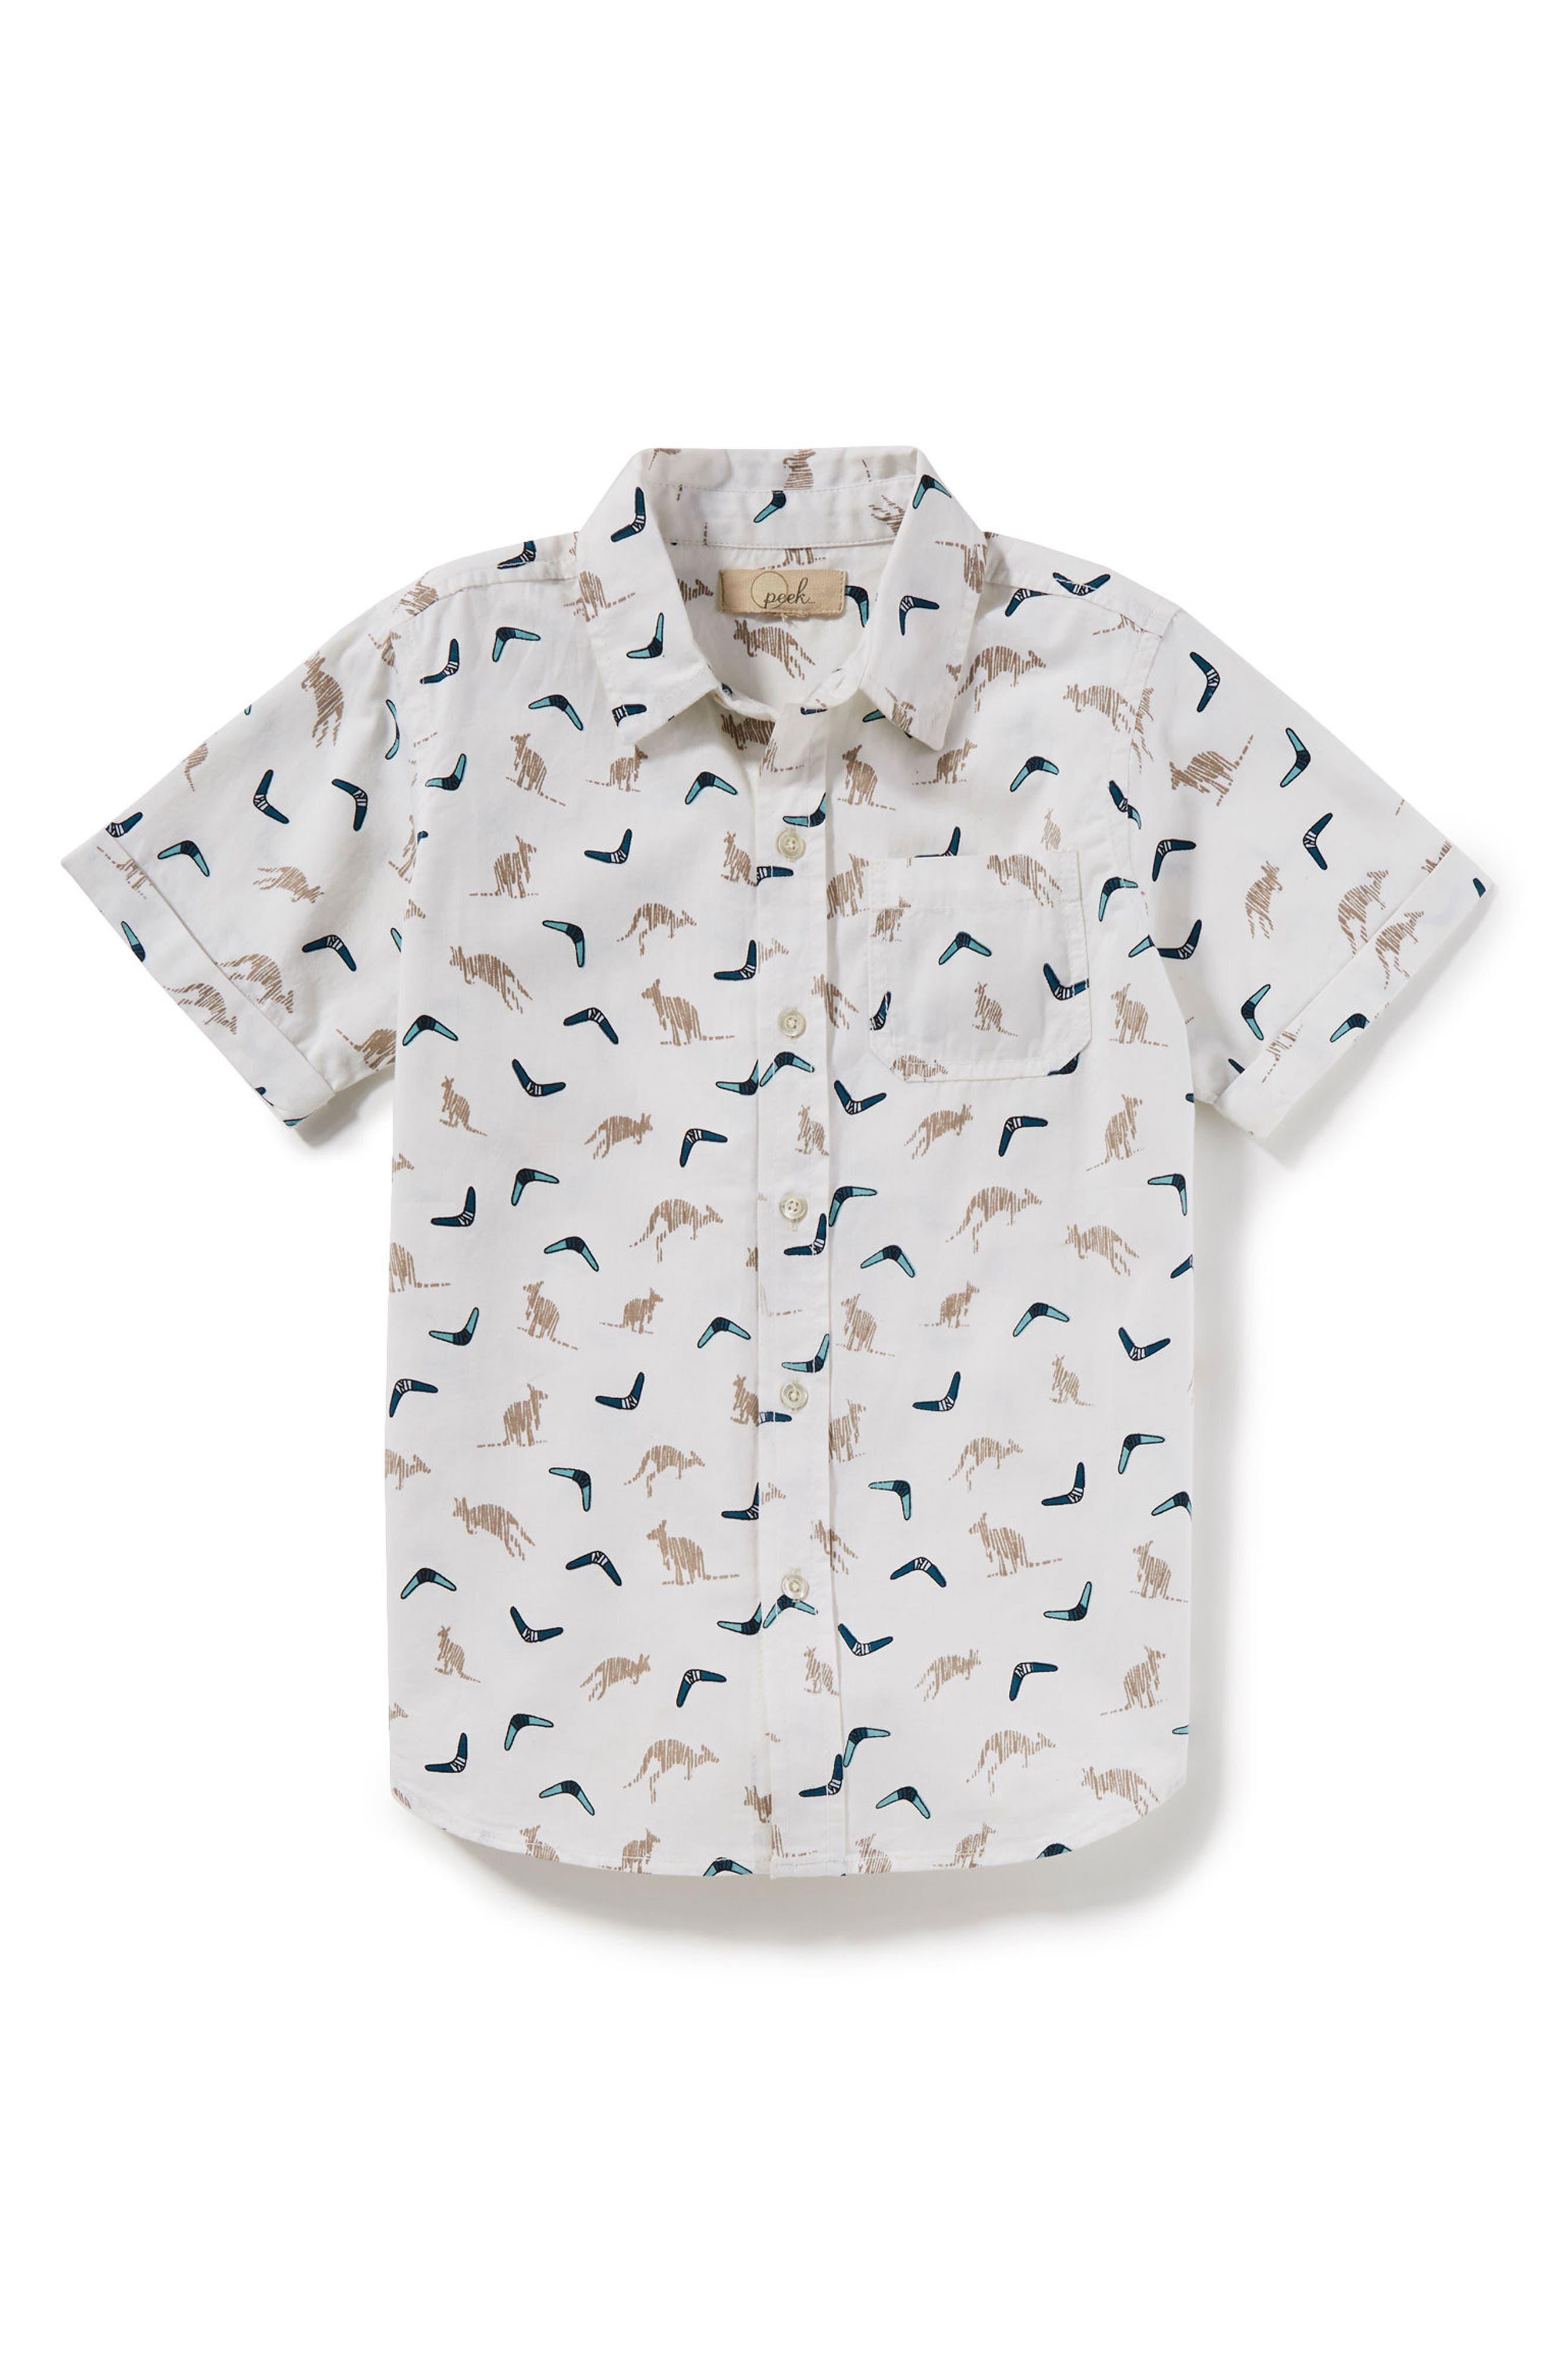 Kangaroo Print Woven Shirt,                         Main,                         color, Ivory